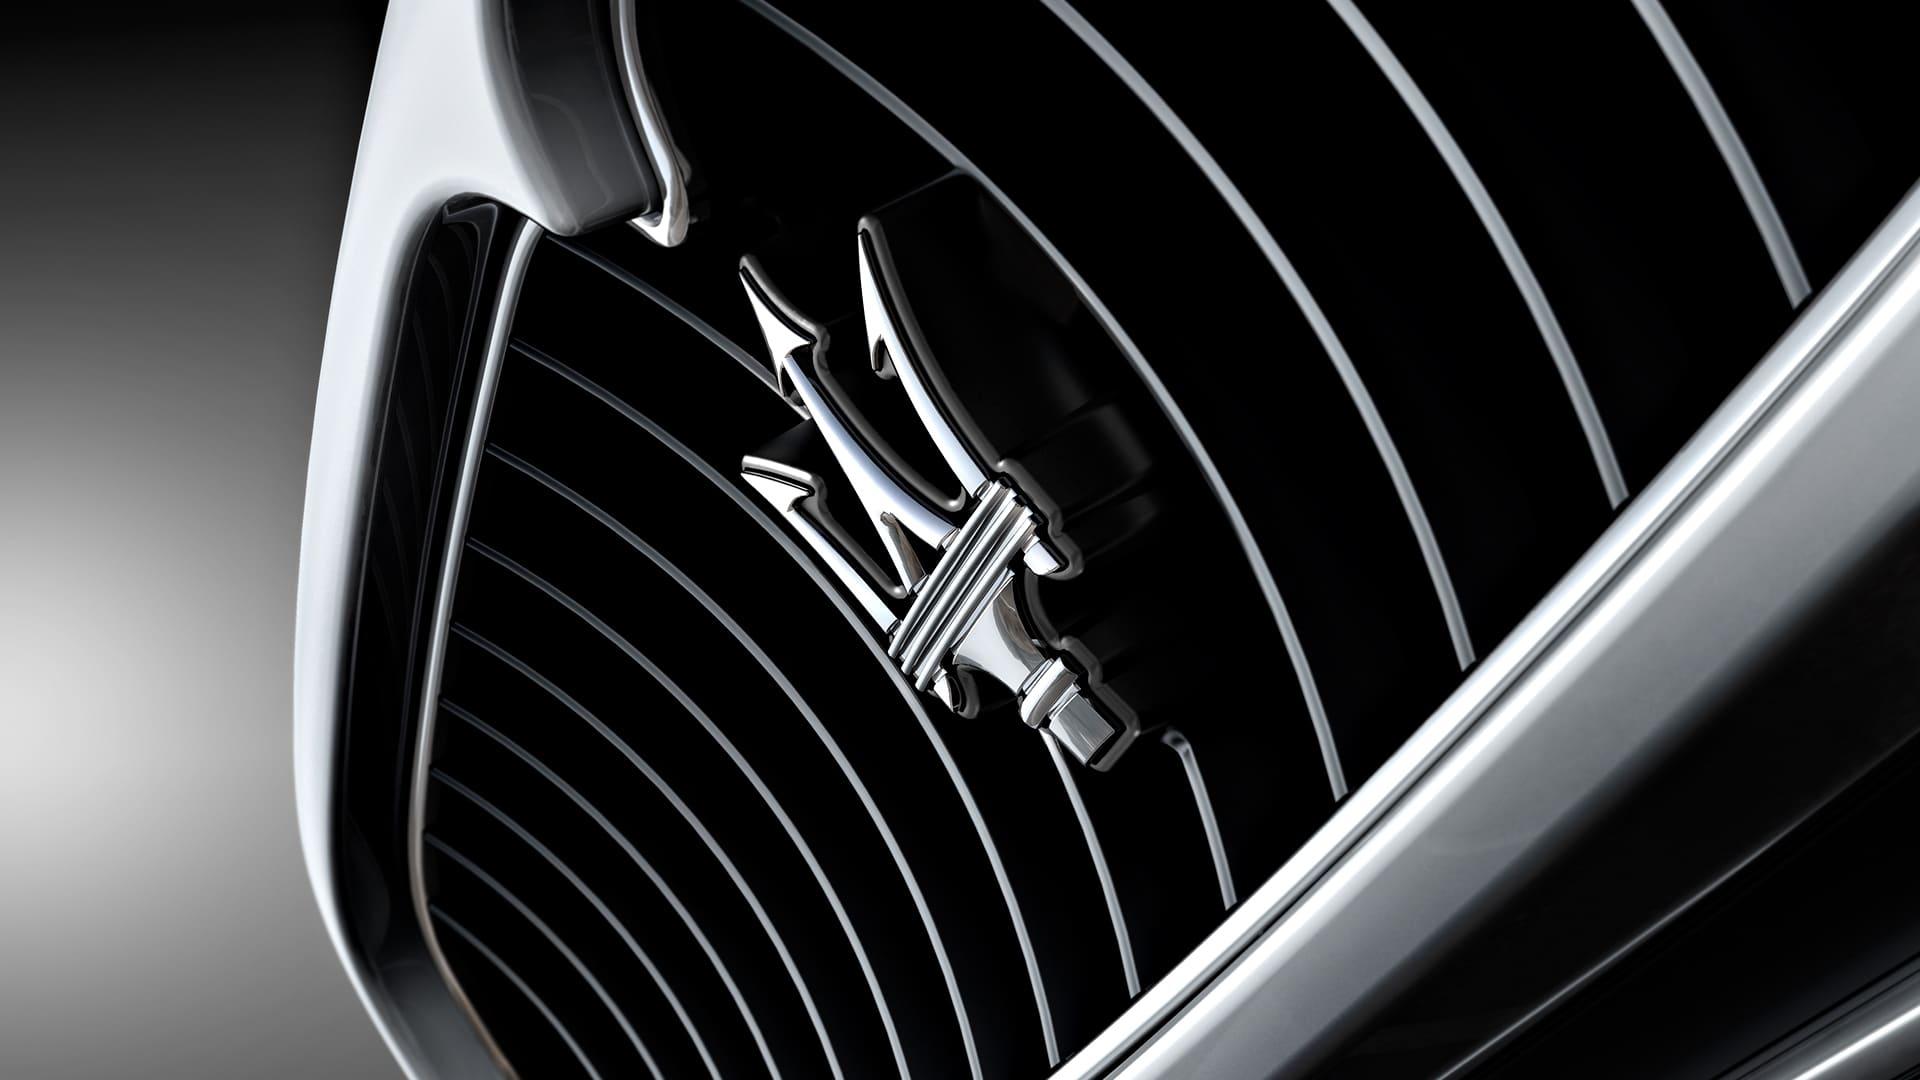 Finance your Maserati Ghibli with Fast Car Finance